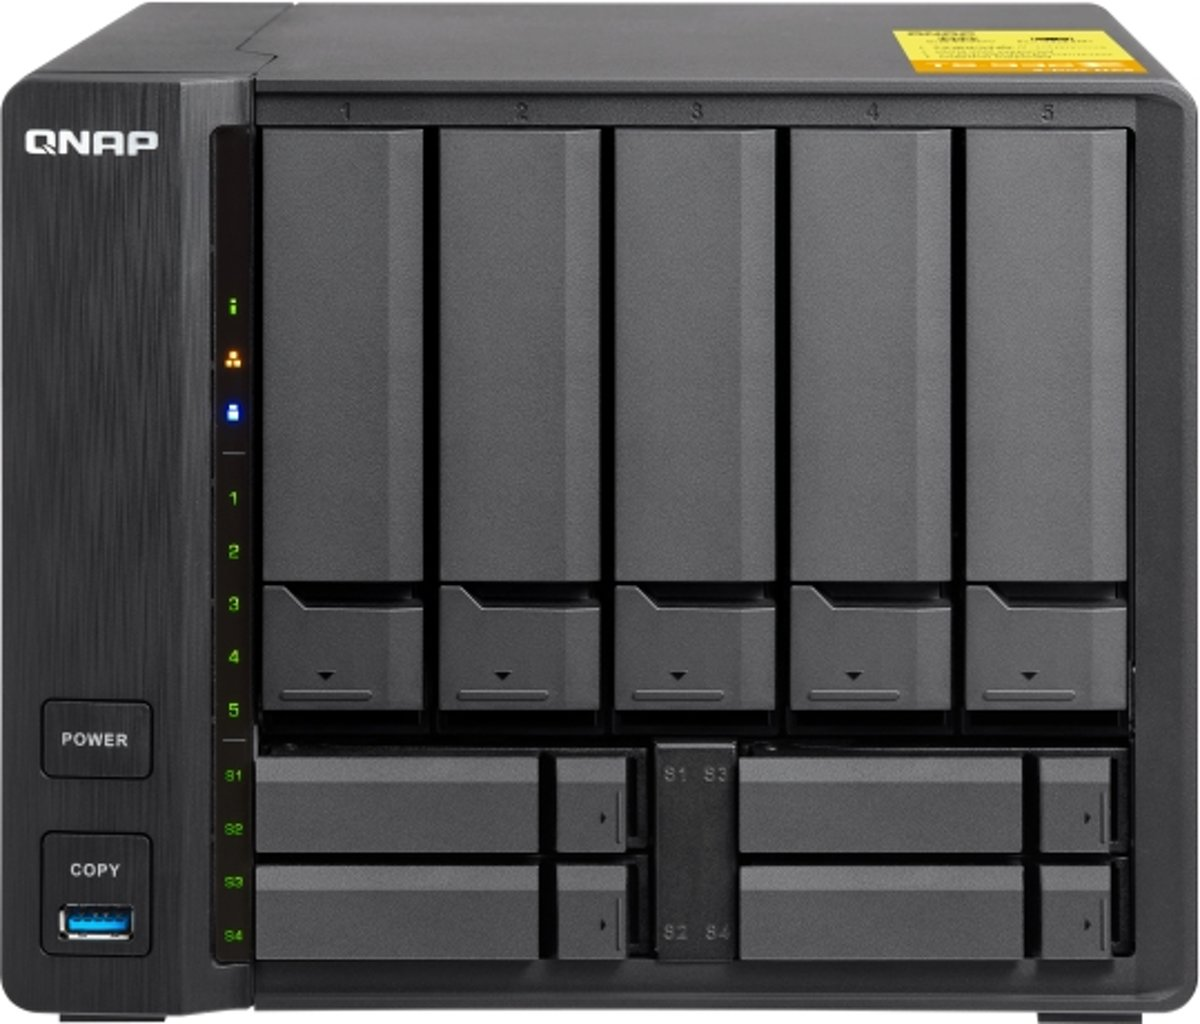 QNAP TS-453BT3-8G NAS-serverbehuizing 4 Bay Multimedia afstandsbediening, 2x M.2 slot